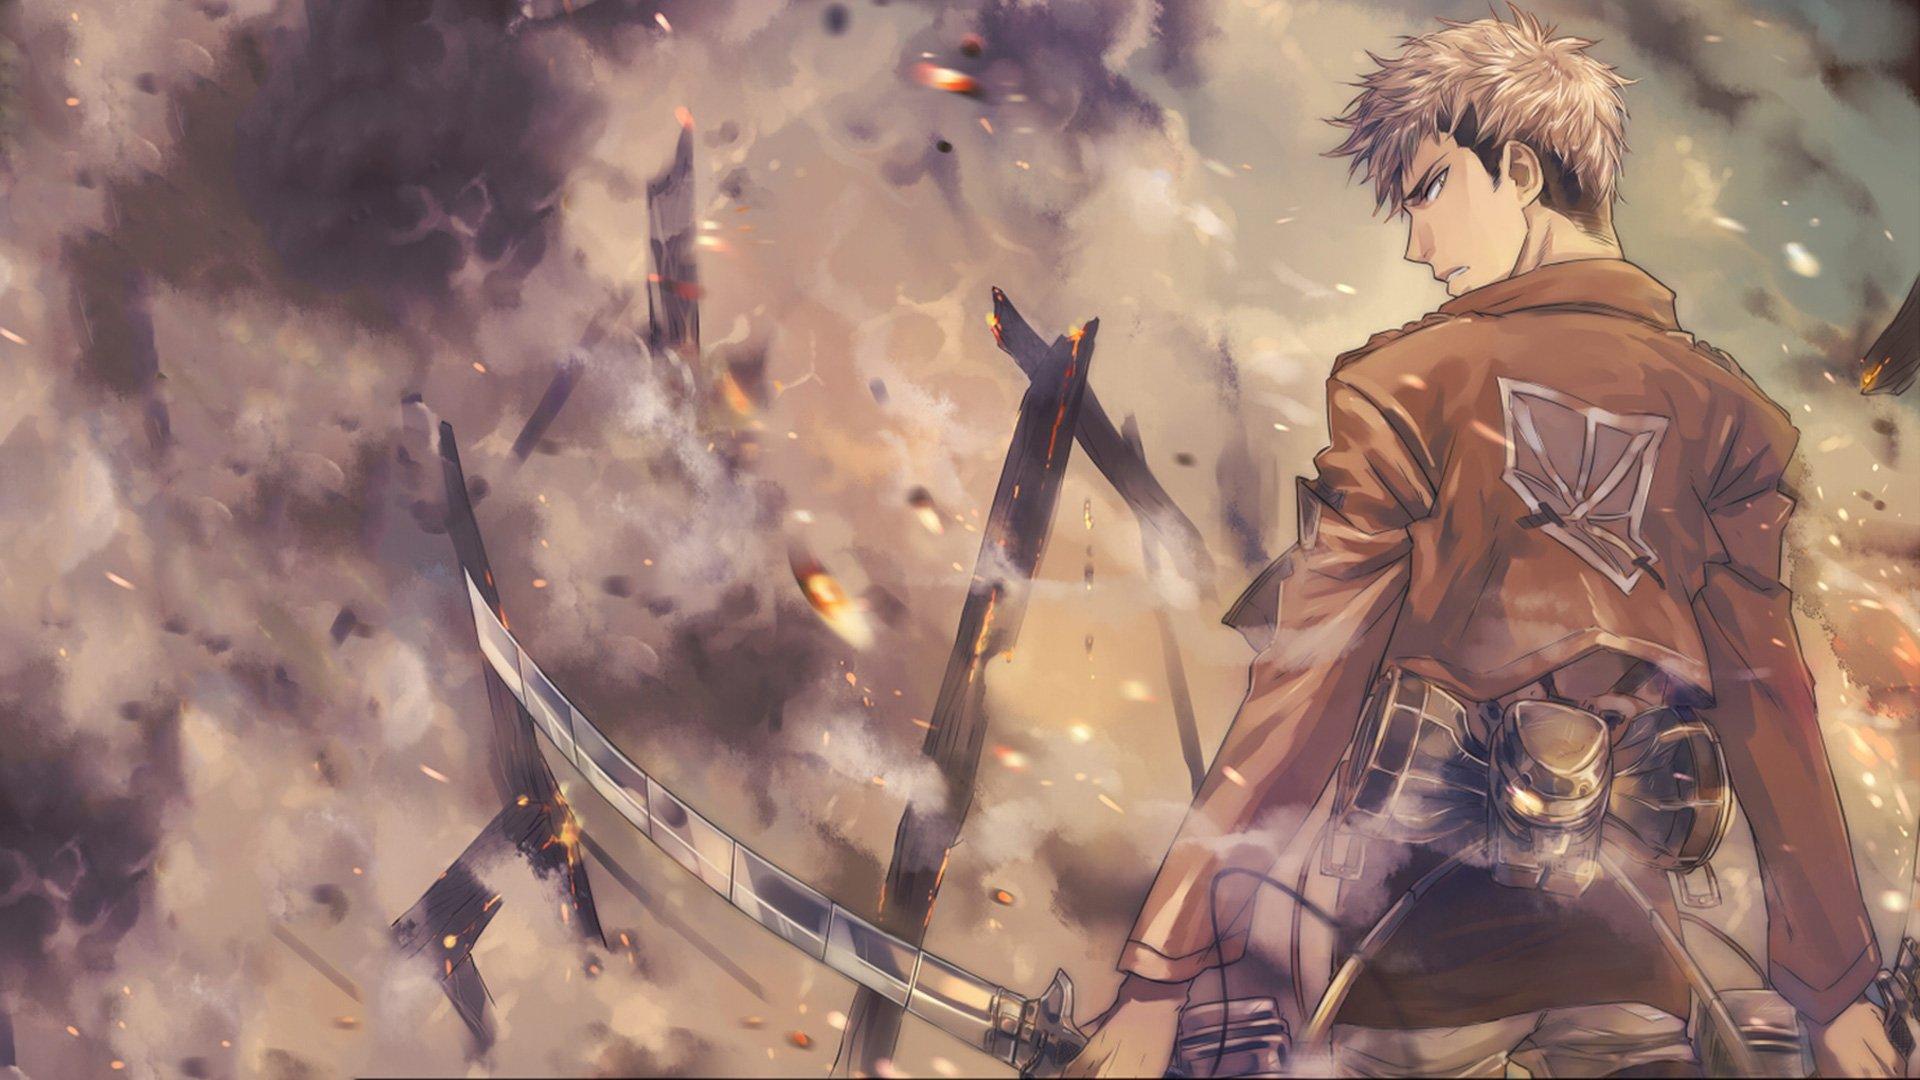 Shingeki No Kyojin Jean Kirstein Hd Wallpaper Background Image 1920x1080 Id 607875 Wallpaper Abyss